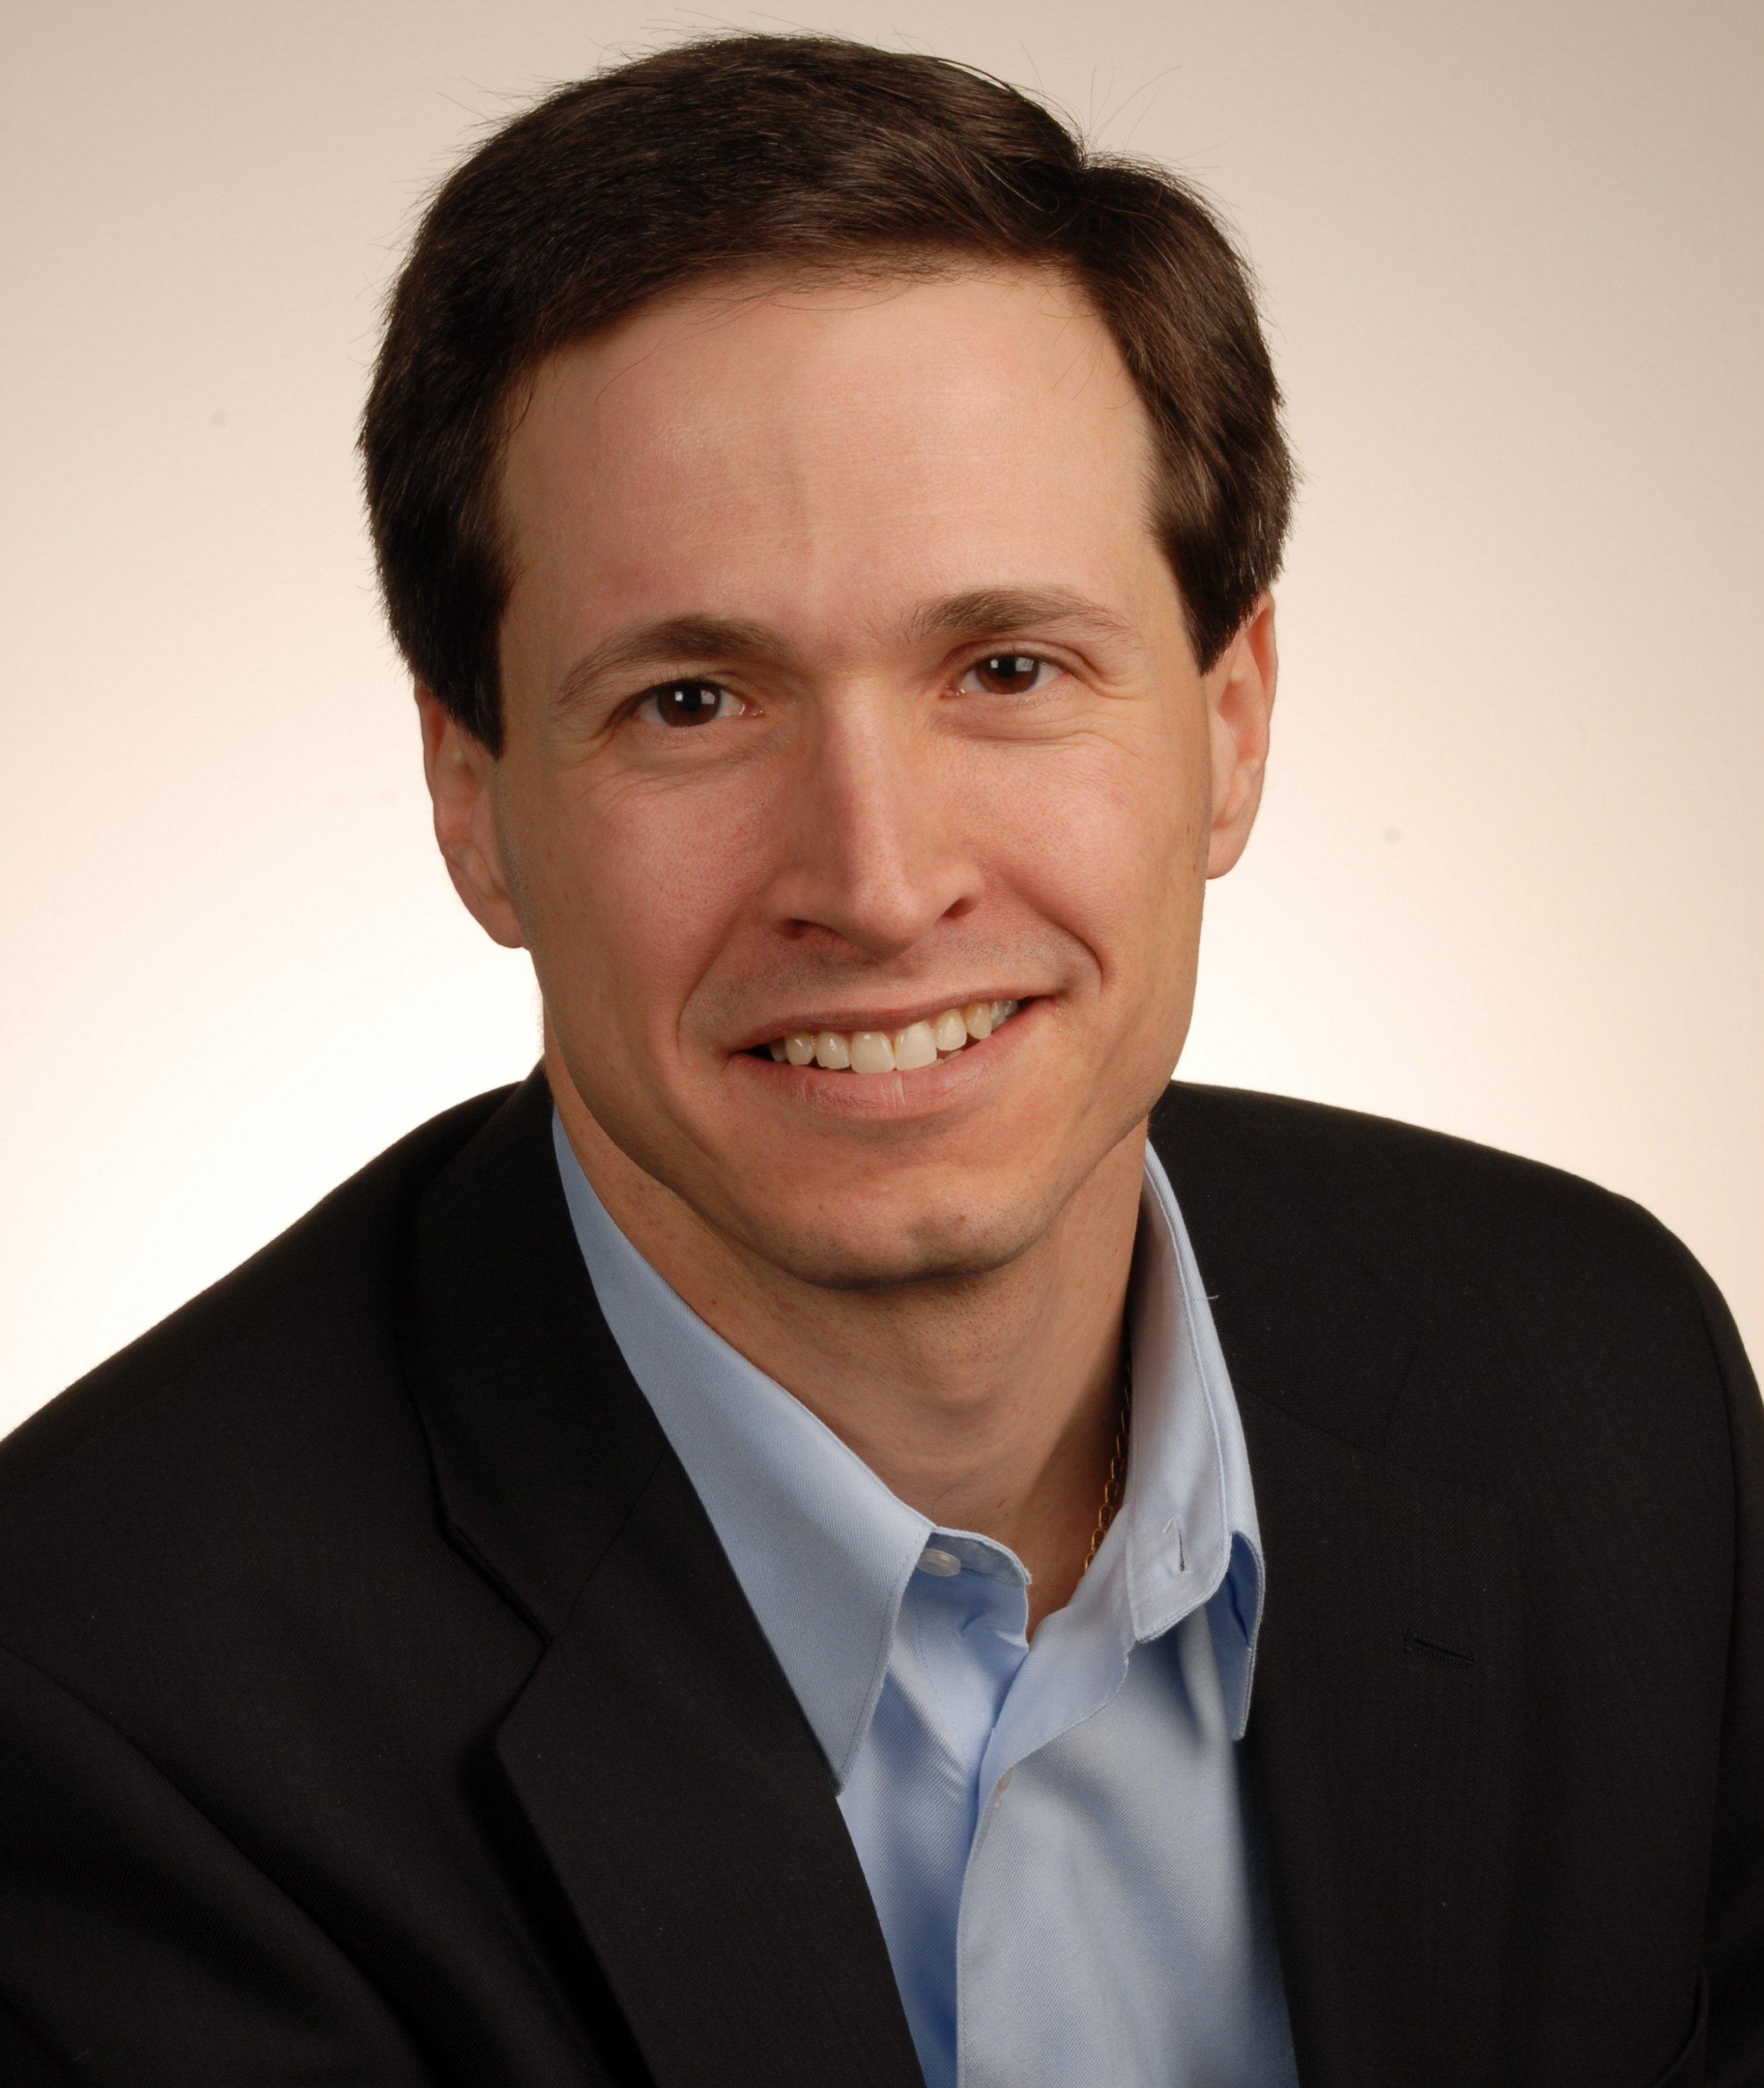 Chris DiCostanzo VP, Client Relations